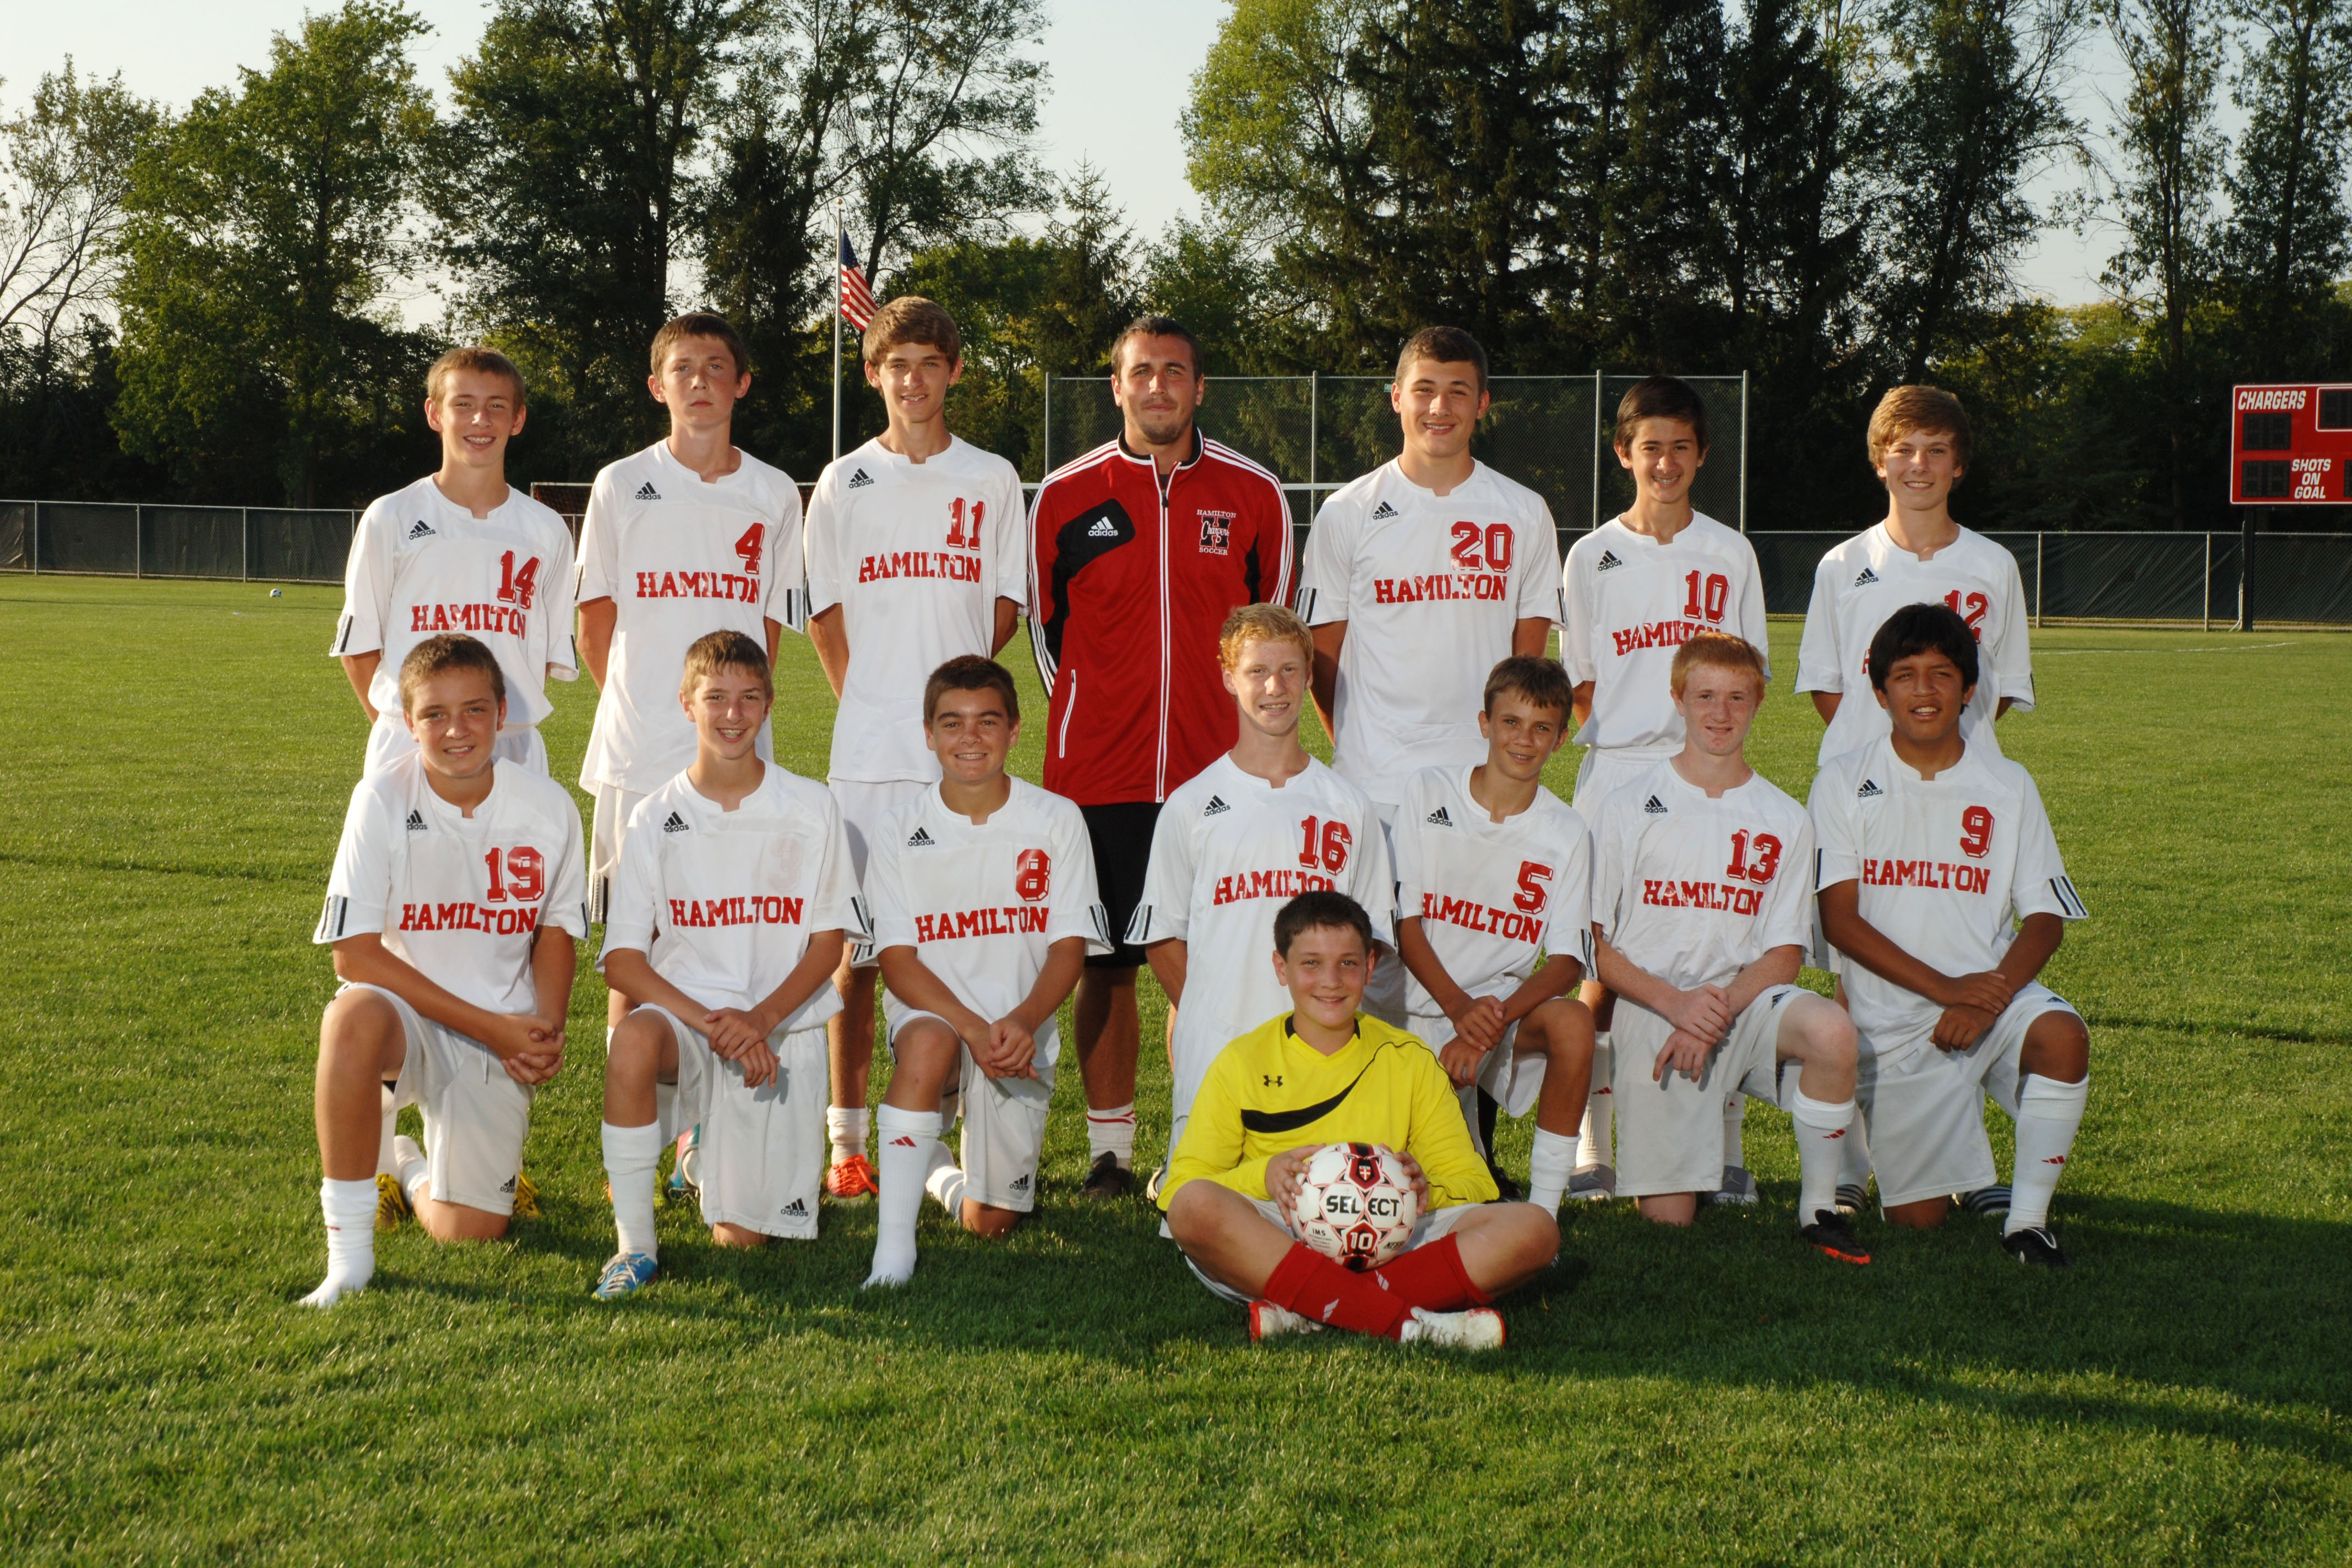 b soccer jv2